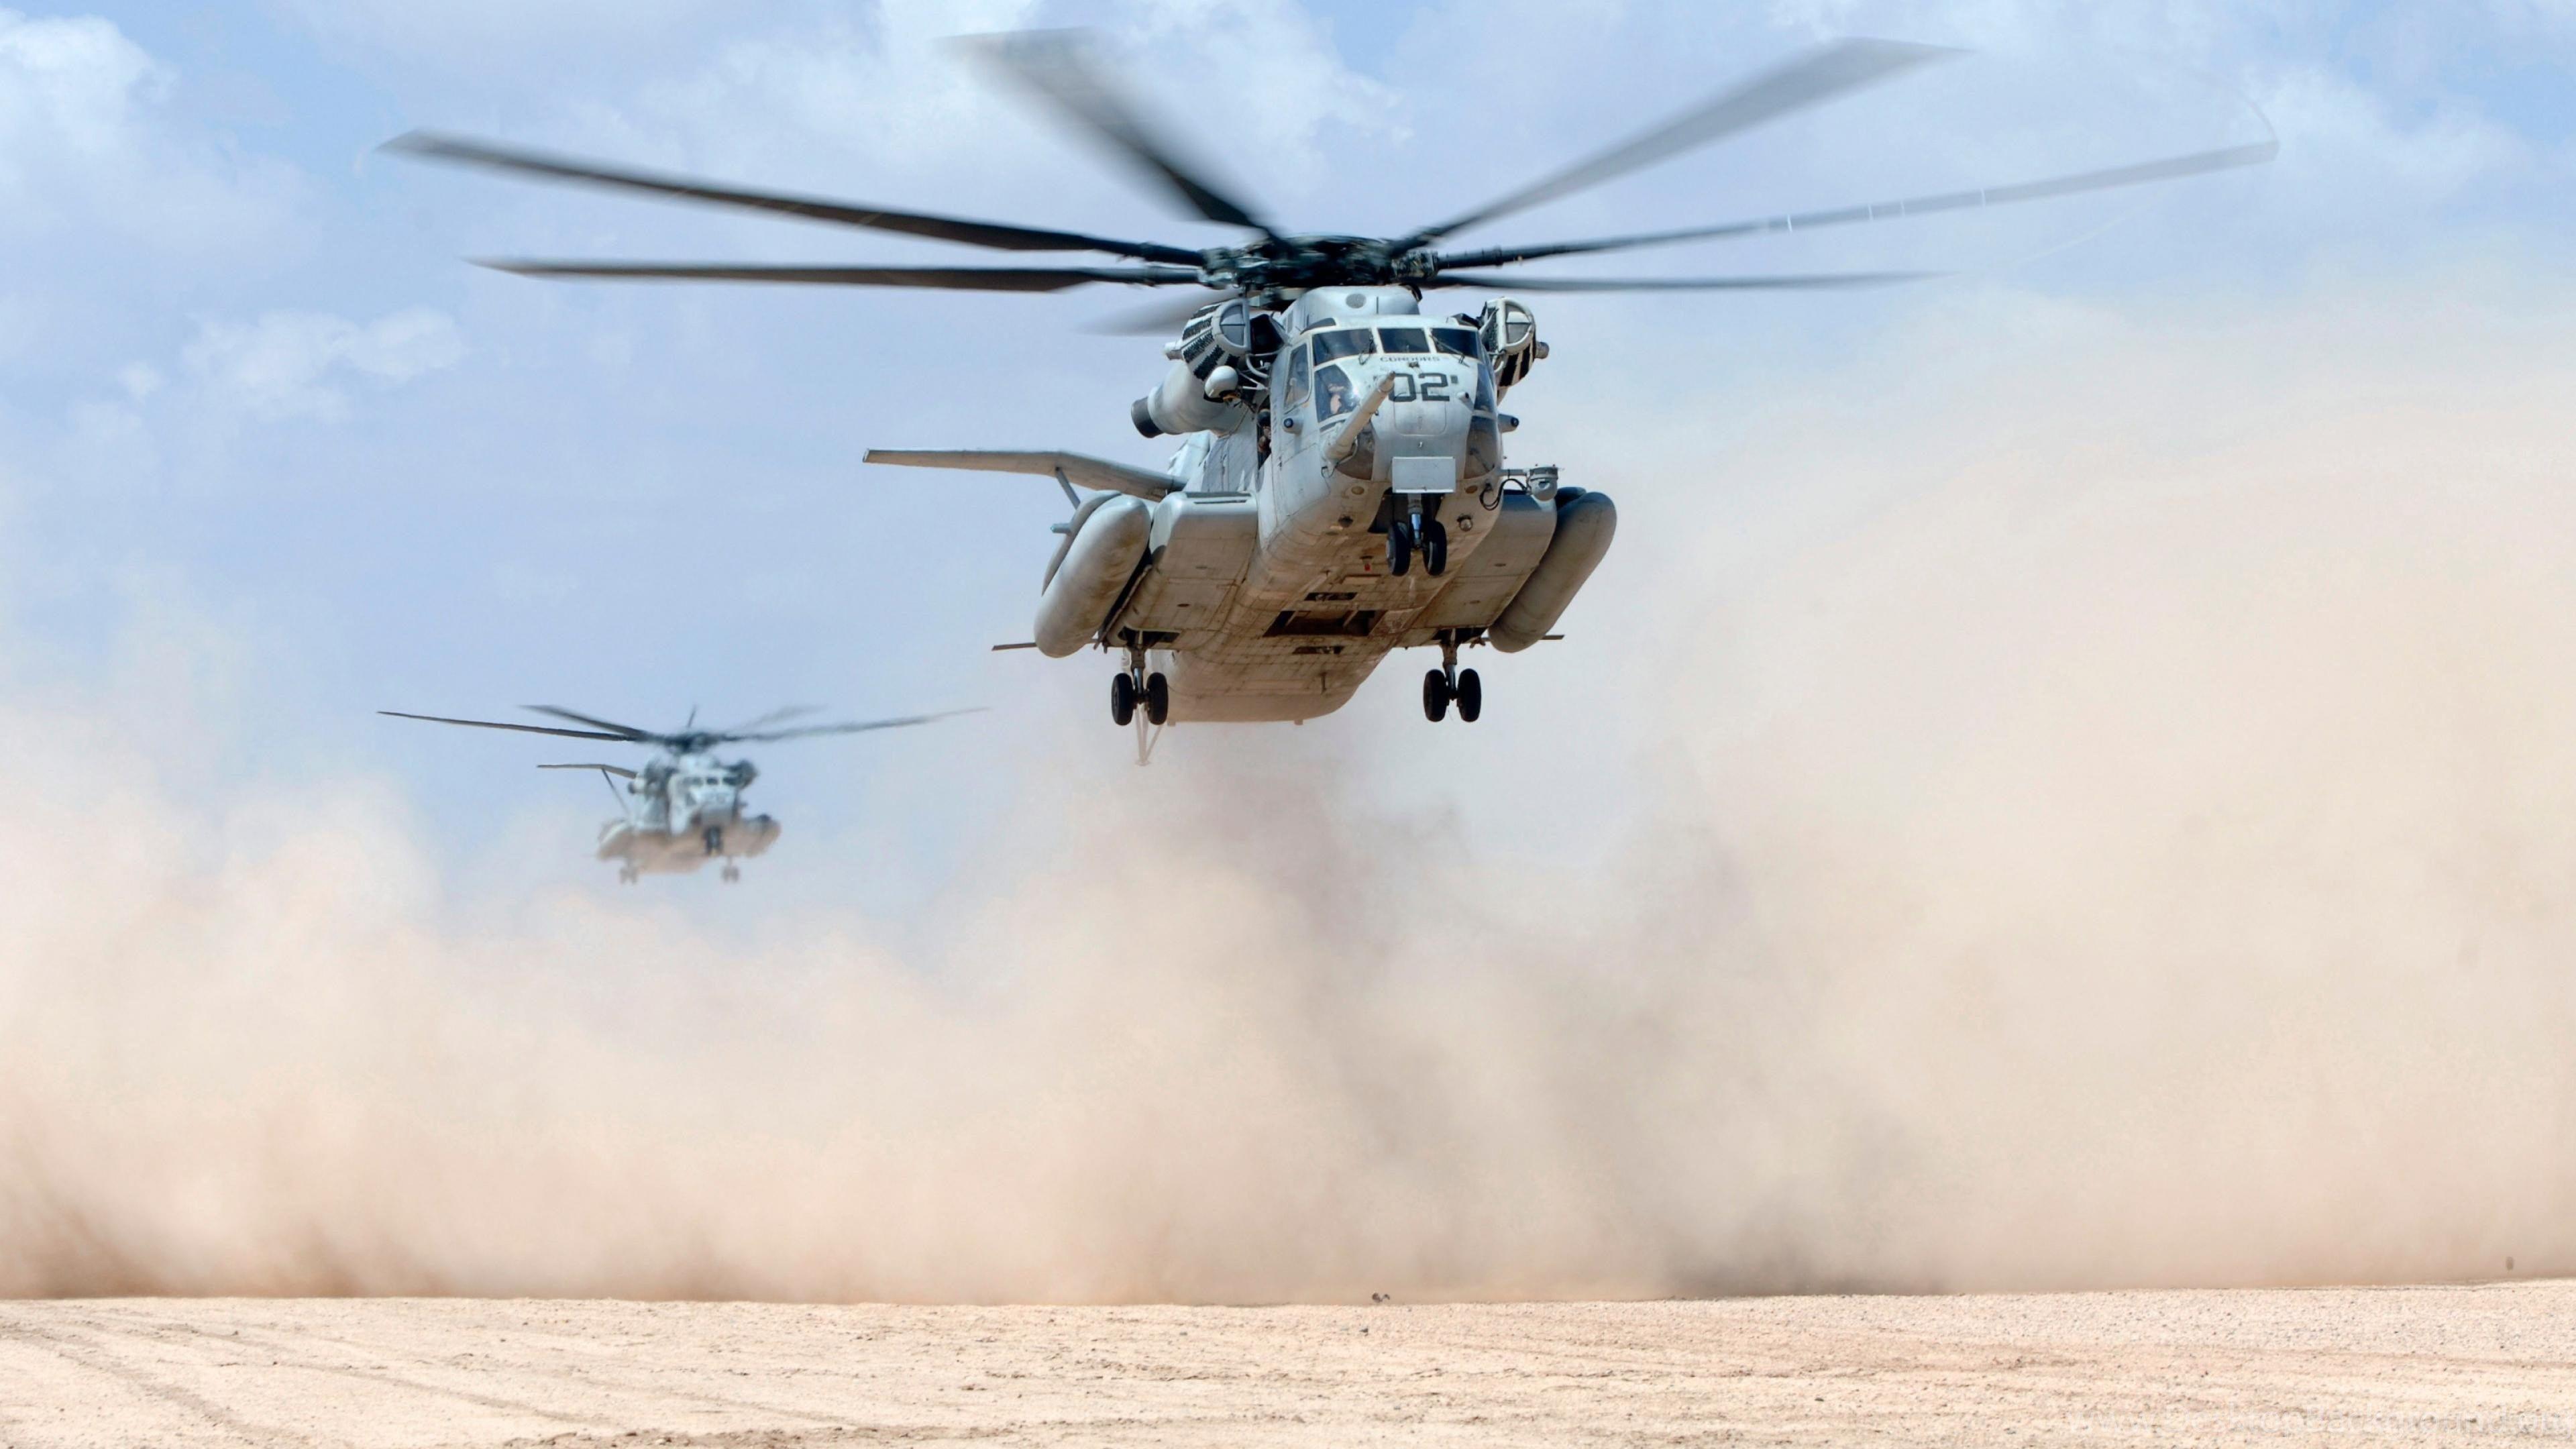 Military Helicopter 4k Hd Desktop Wallpaper For 4k Ultra: Military 4K Ultra HD Wallpapers